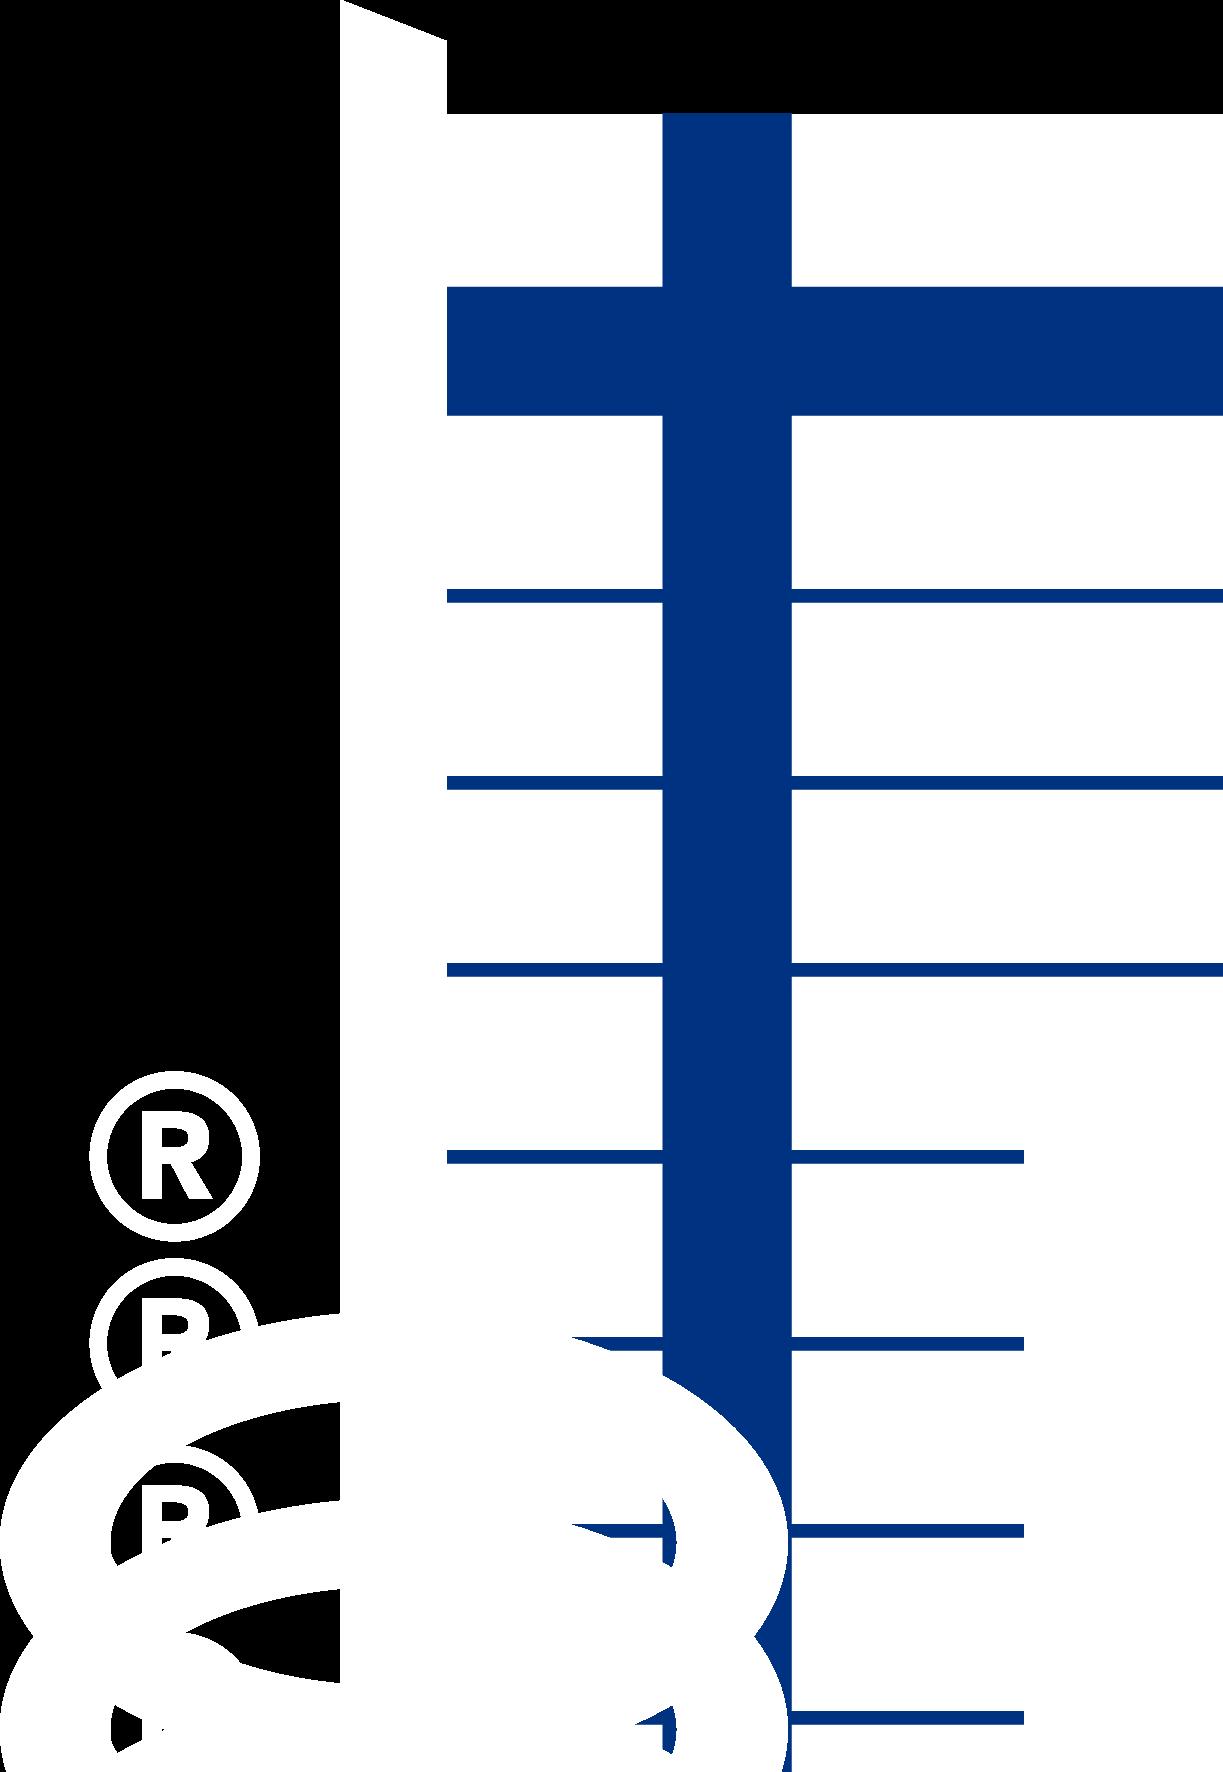 Avainlippu